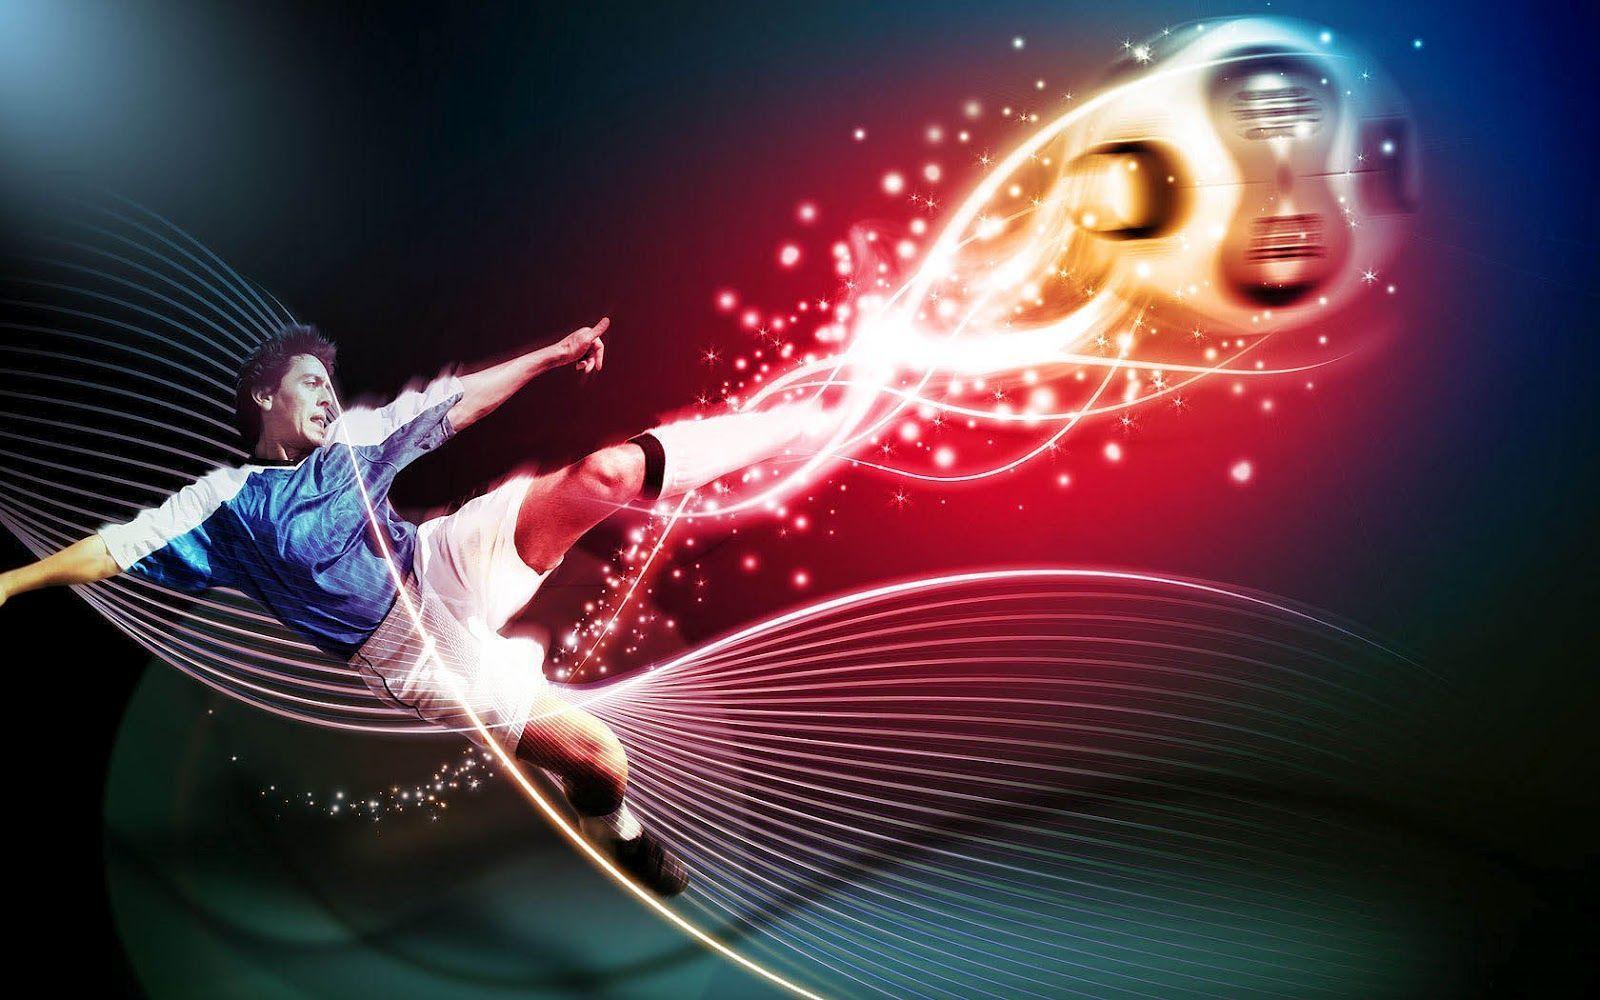 Fondo De Fútbol Hd: Cool Soccer Backgrounds